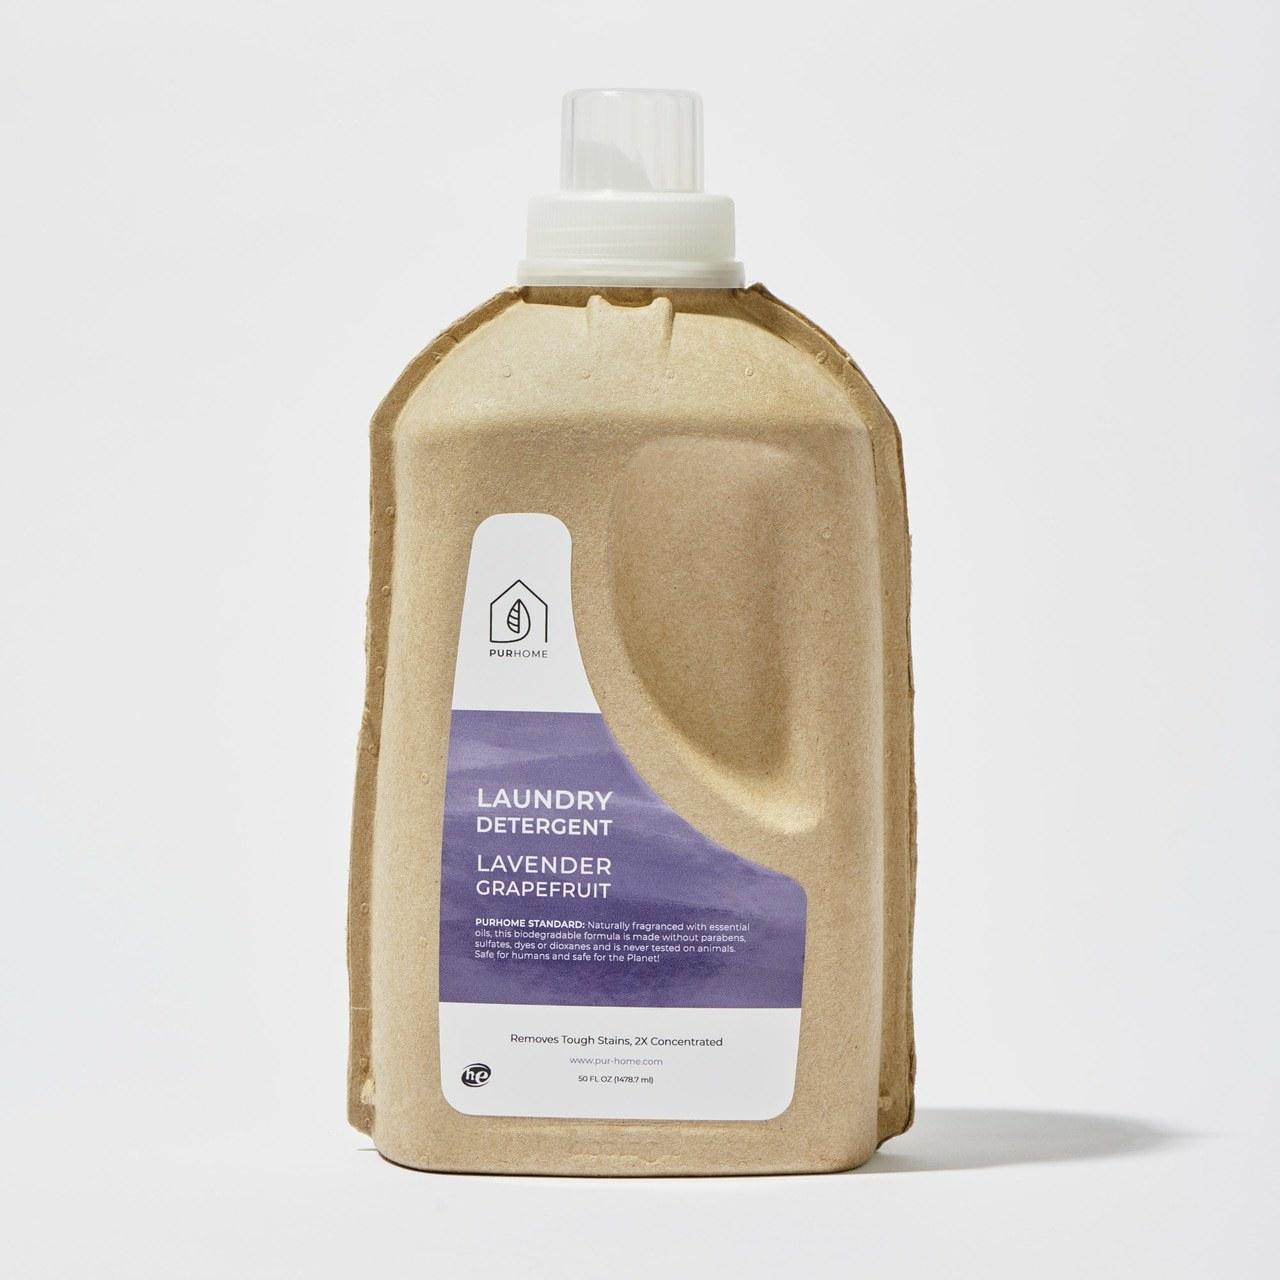 Product photo showing PurHome lavender grapefruit laundry detergent